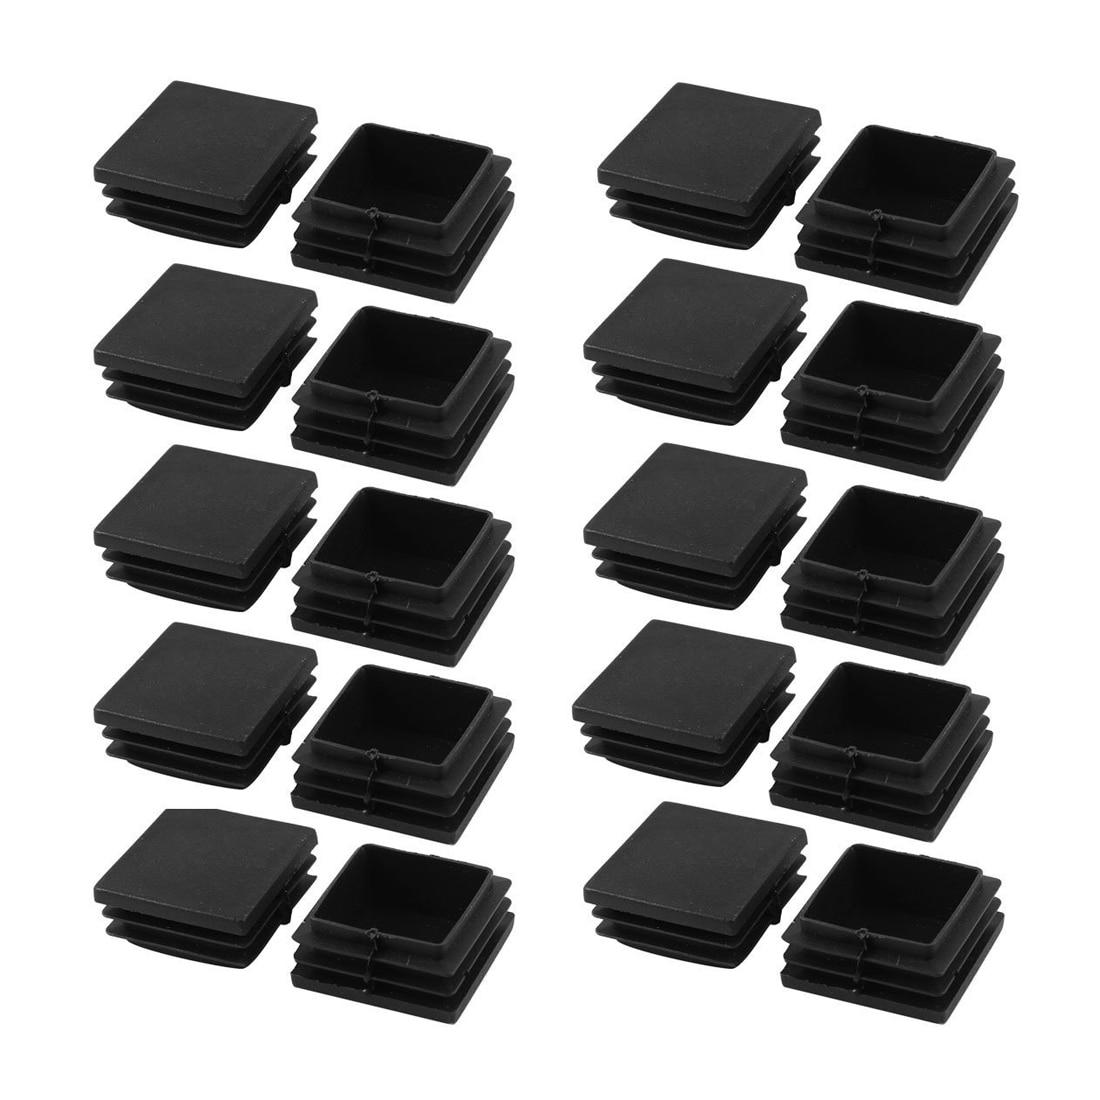 Promotion! 20 Pieces Plastic Square Tube Coupling Cap Plug Cap 40 Mm X 40 Mm Black